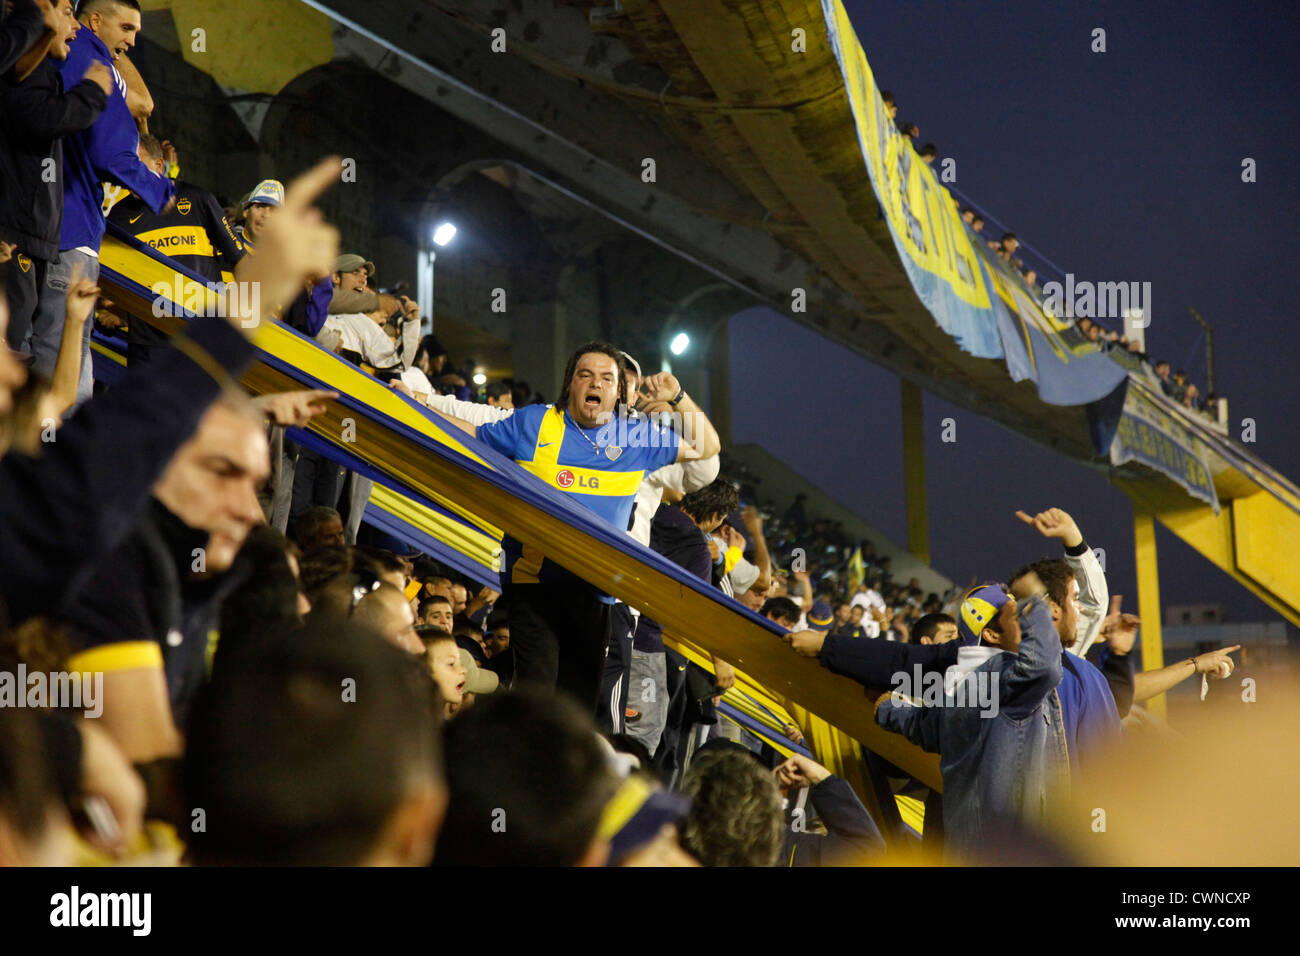 Football match of Boca Juniors at the Bombonera stadium, La Boca, Buenos Aires, Argentina. Stock Photo